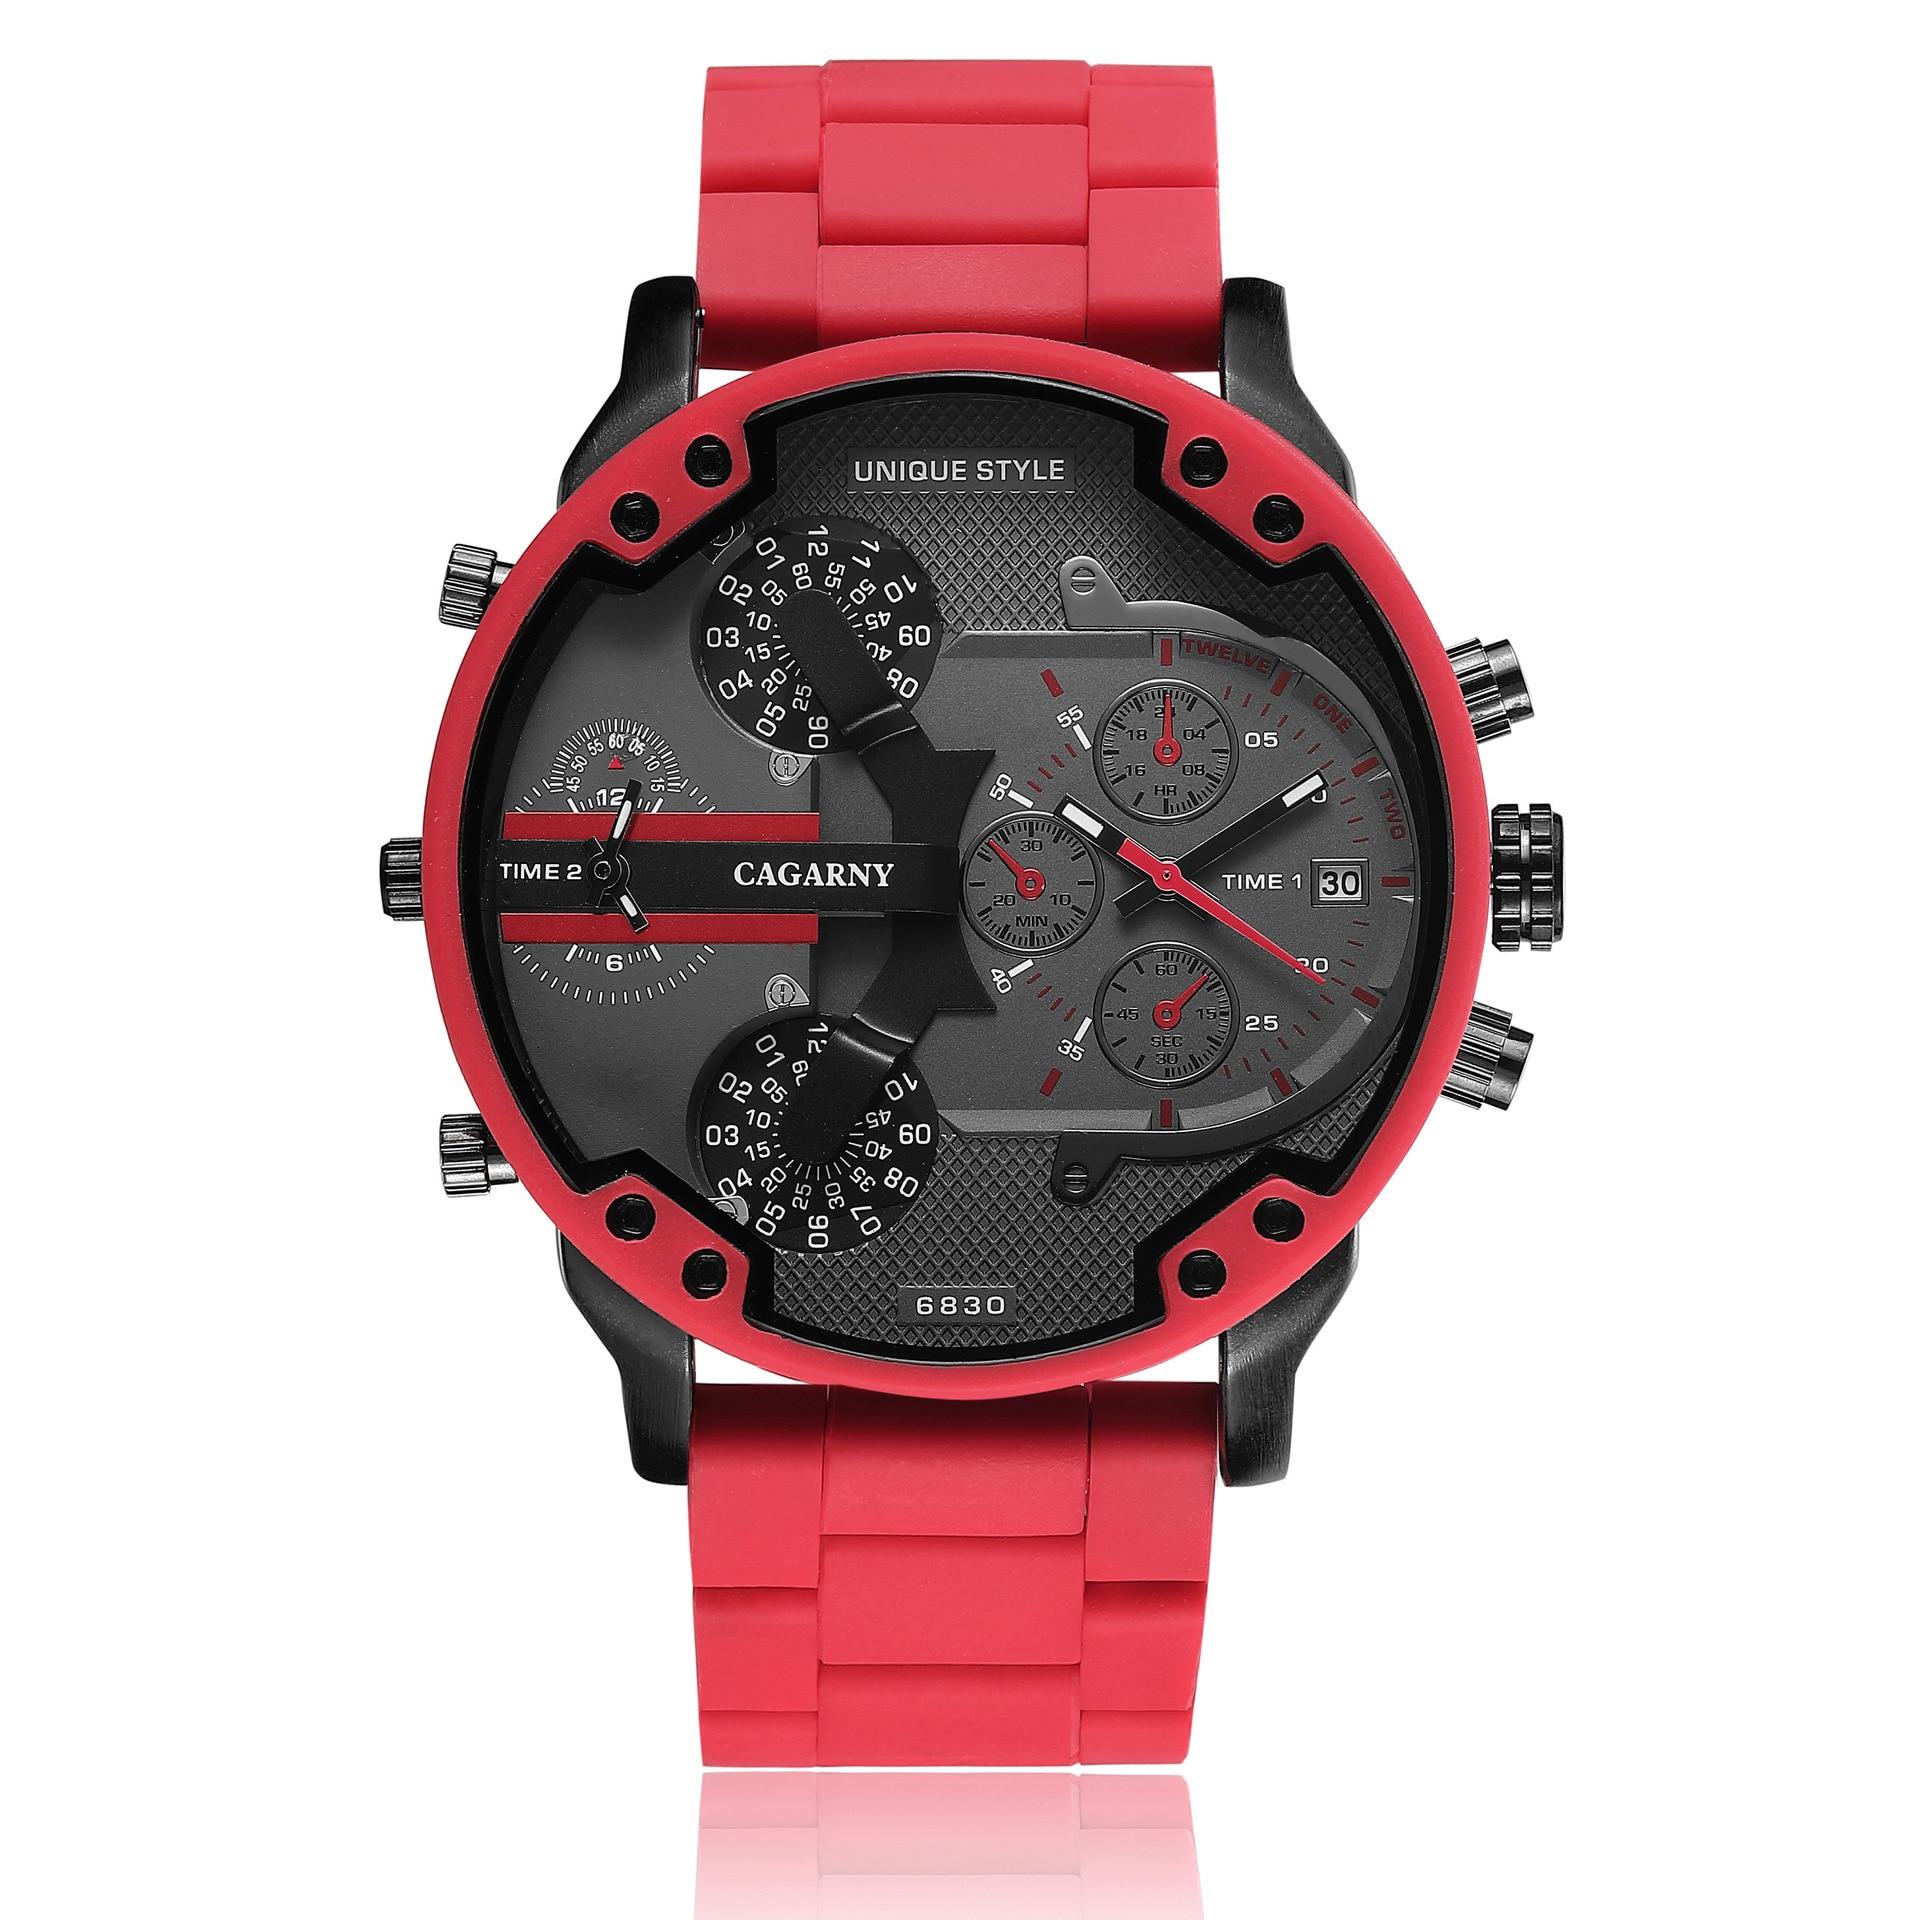 Mens Watch Luxury Fashion Date Display Multi-Time Zone Quartz Watch Military Sports Classic Red Clock Relogio Masculino CAGARNY